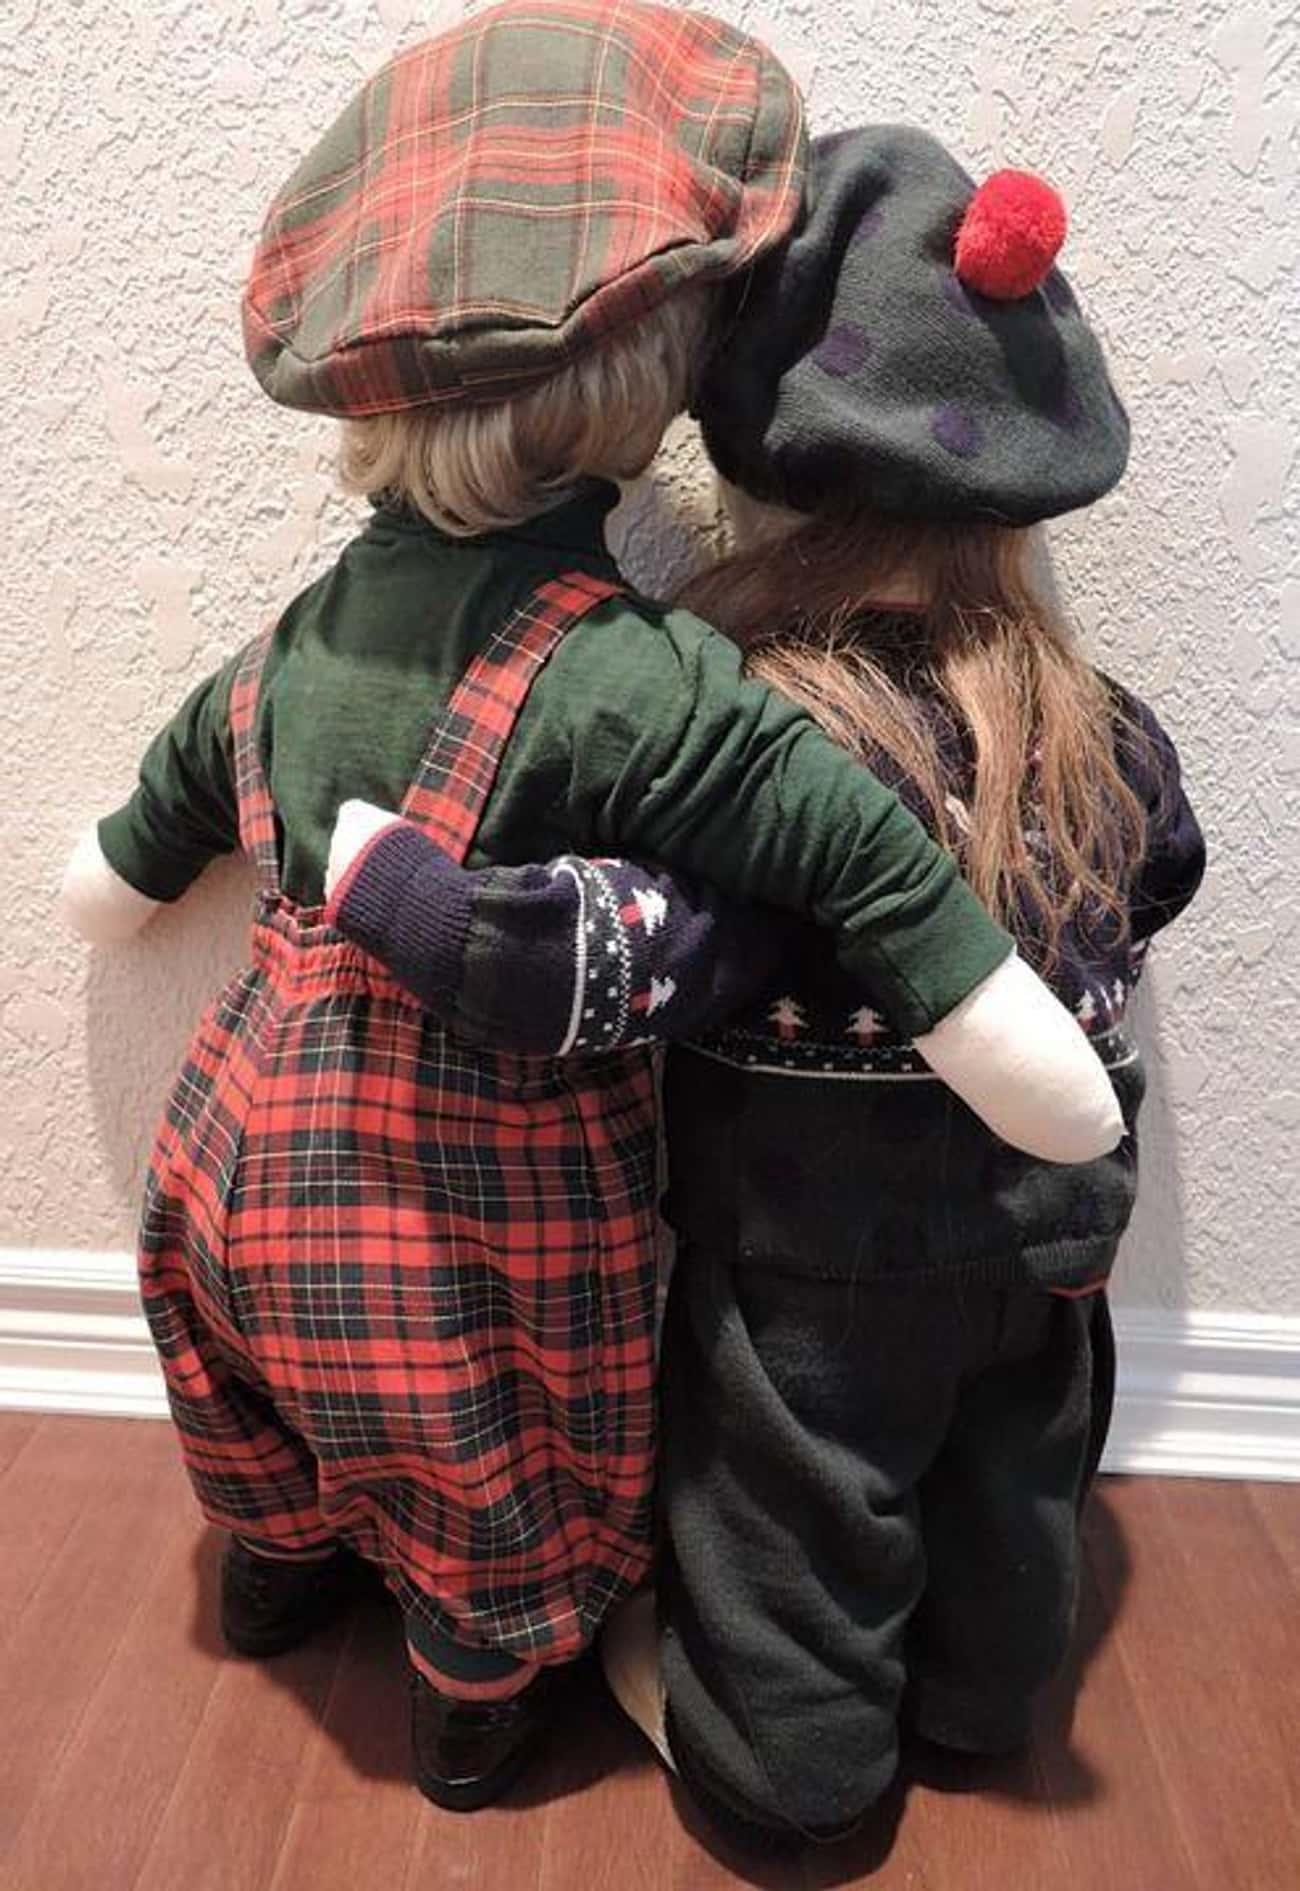 Life-Sized Dolls Of Children